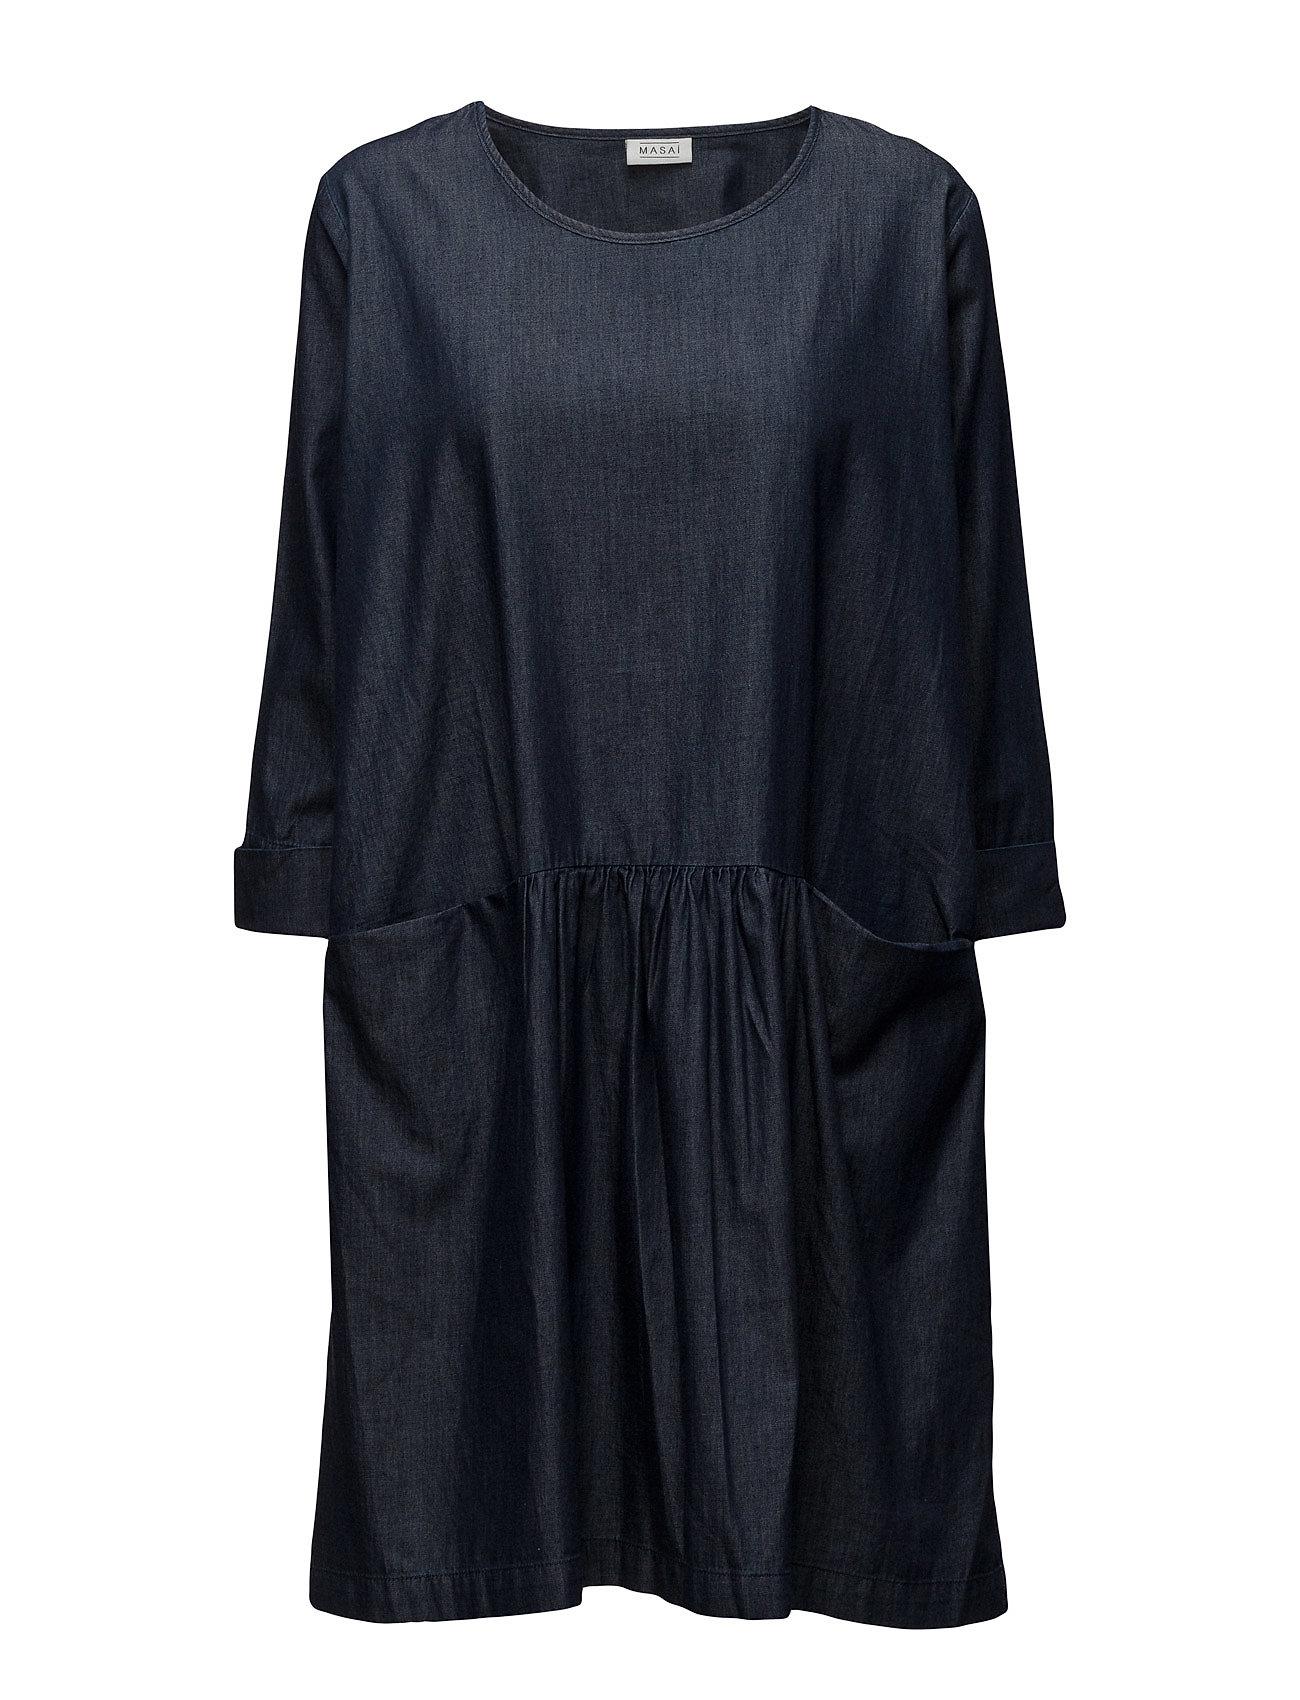 Natala Dress Oversize Masai Kjoler til Kvinder i